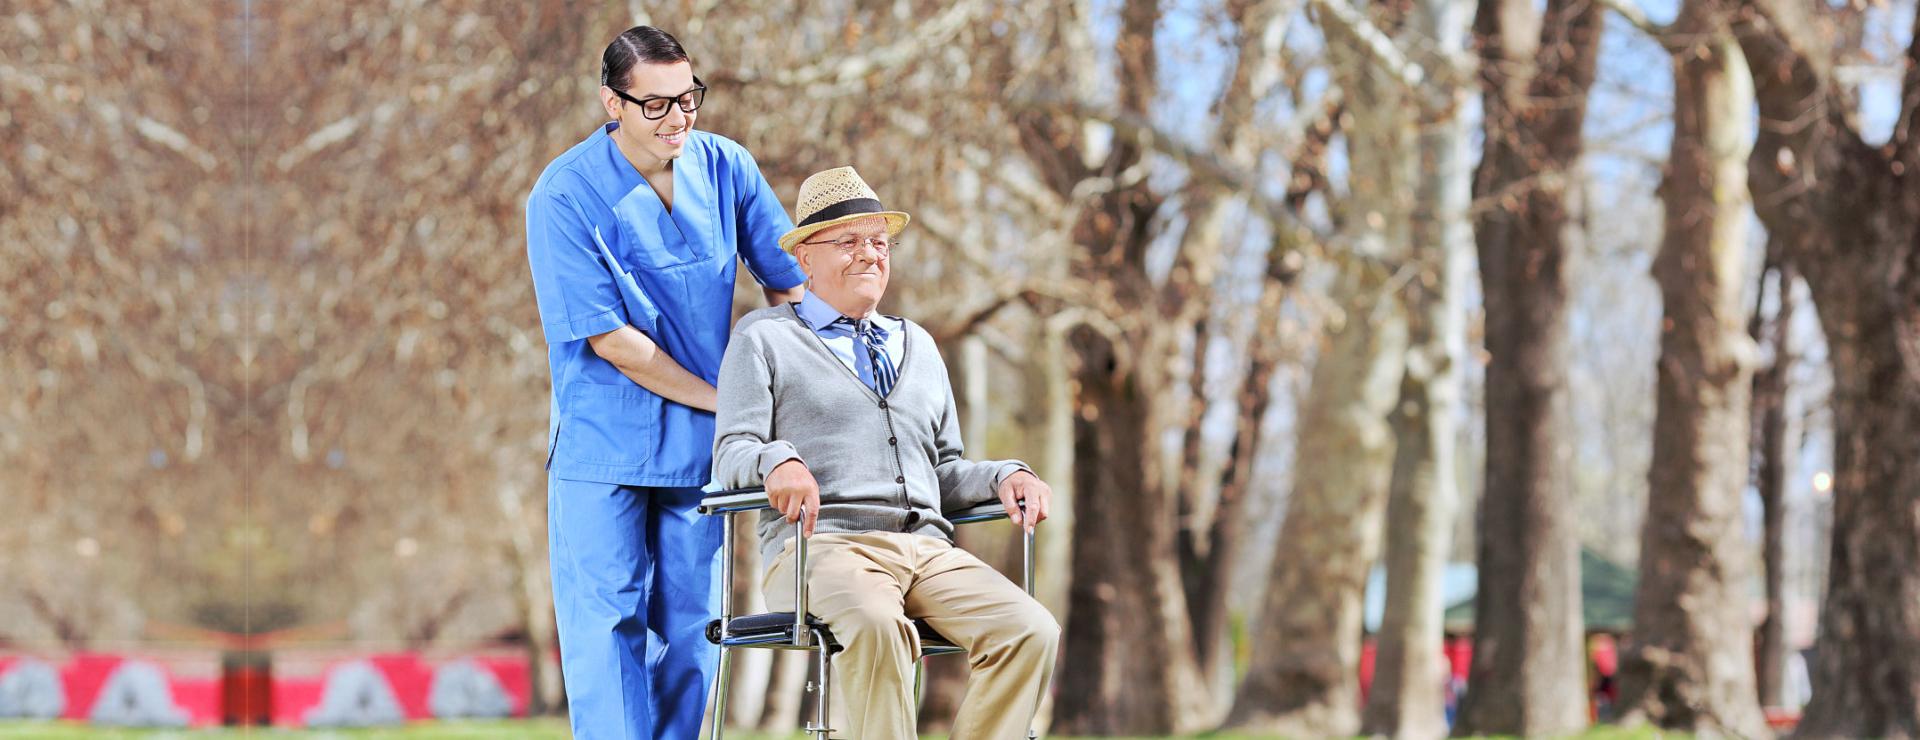 caregiver pushing an elderly man's wheelchair outdoors